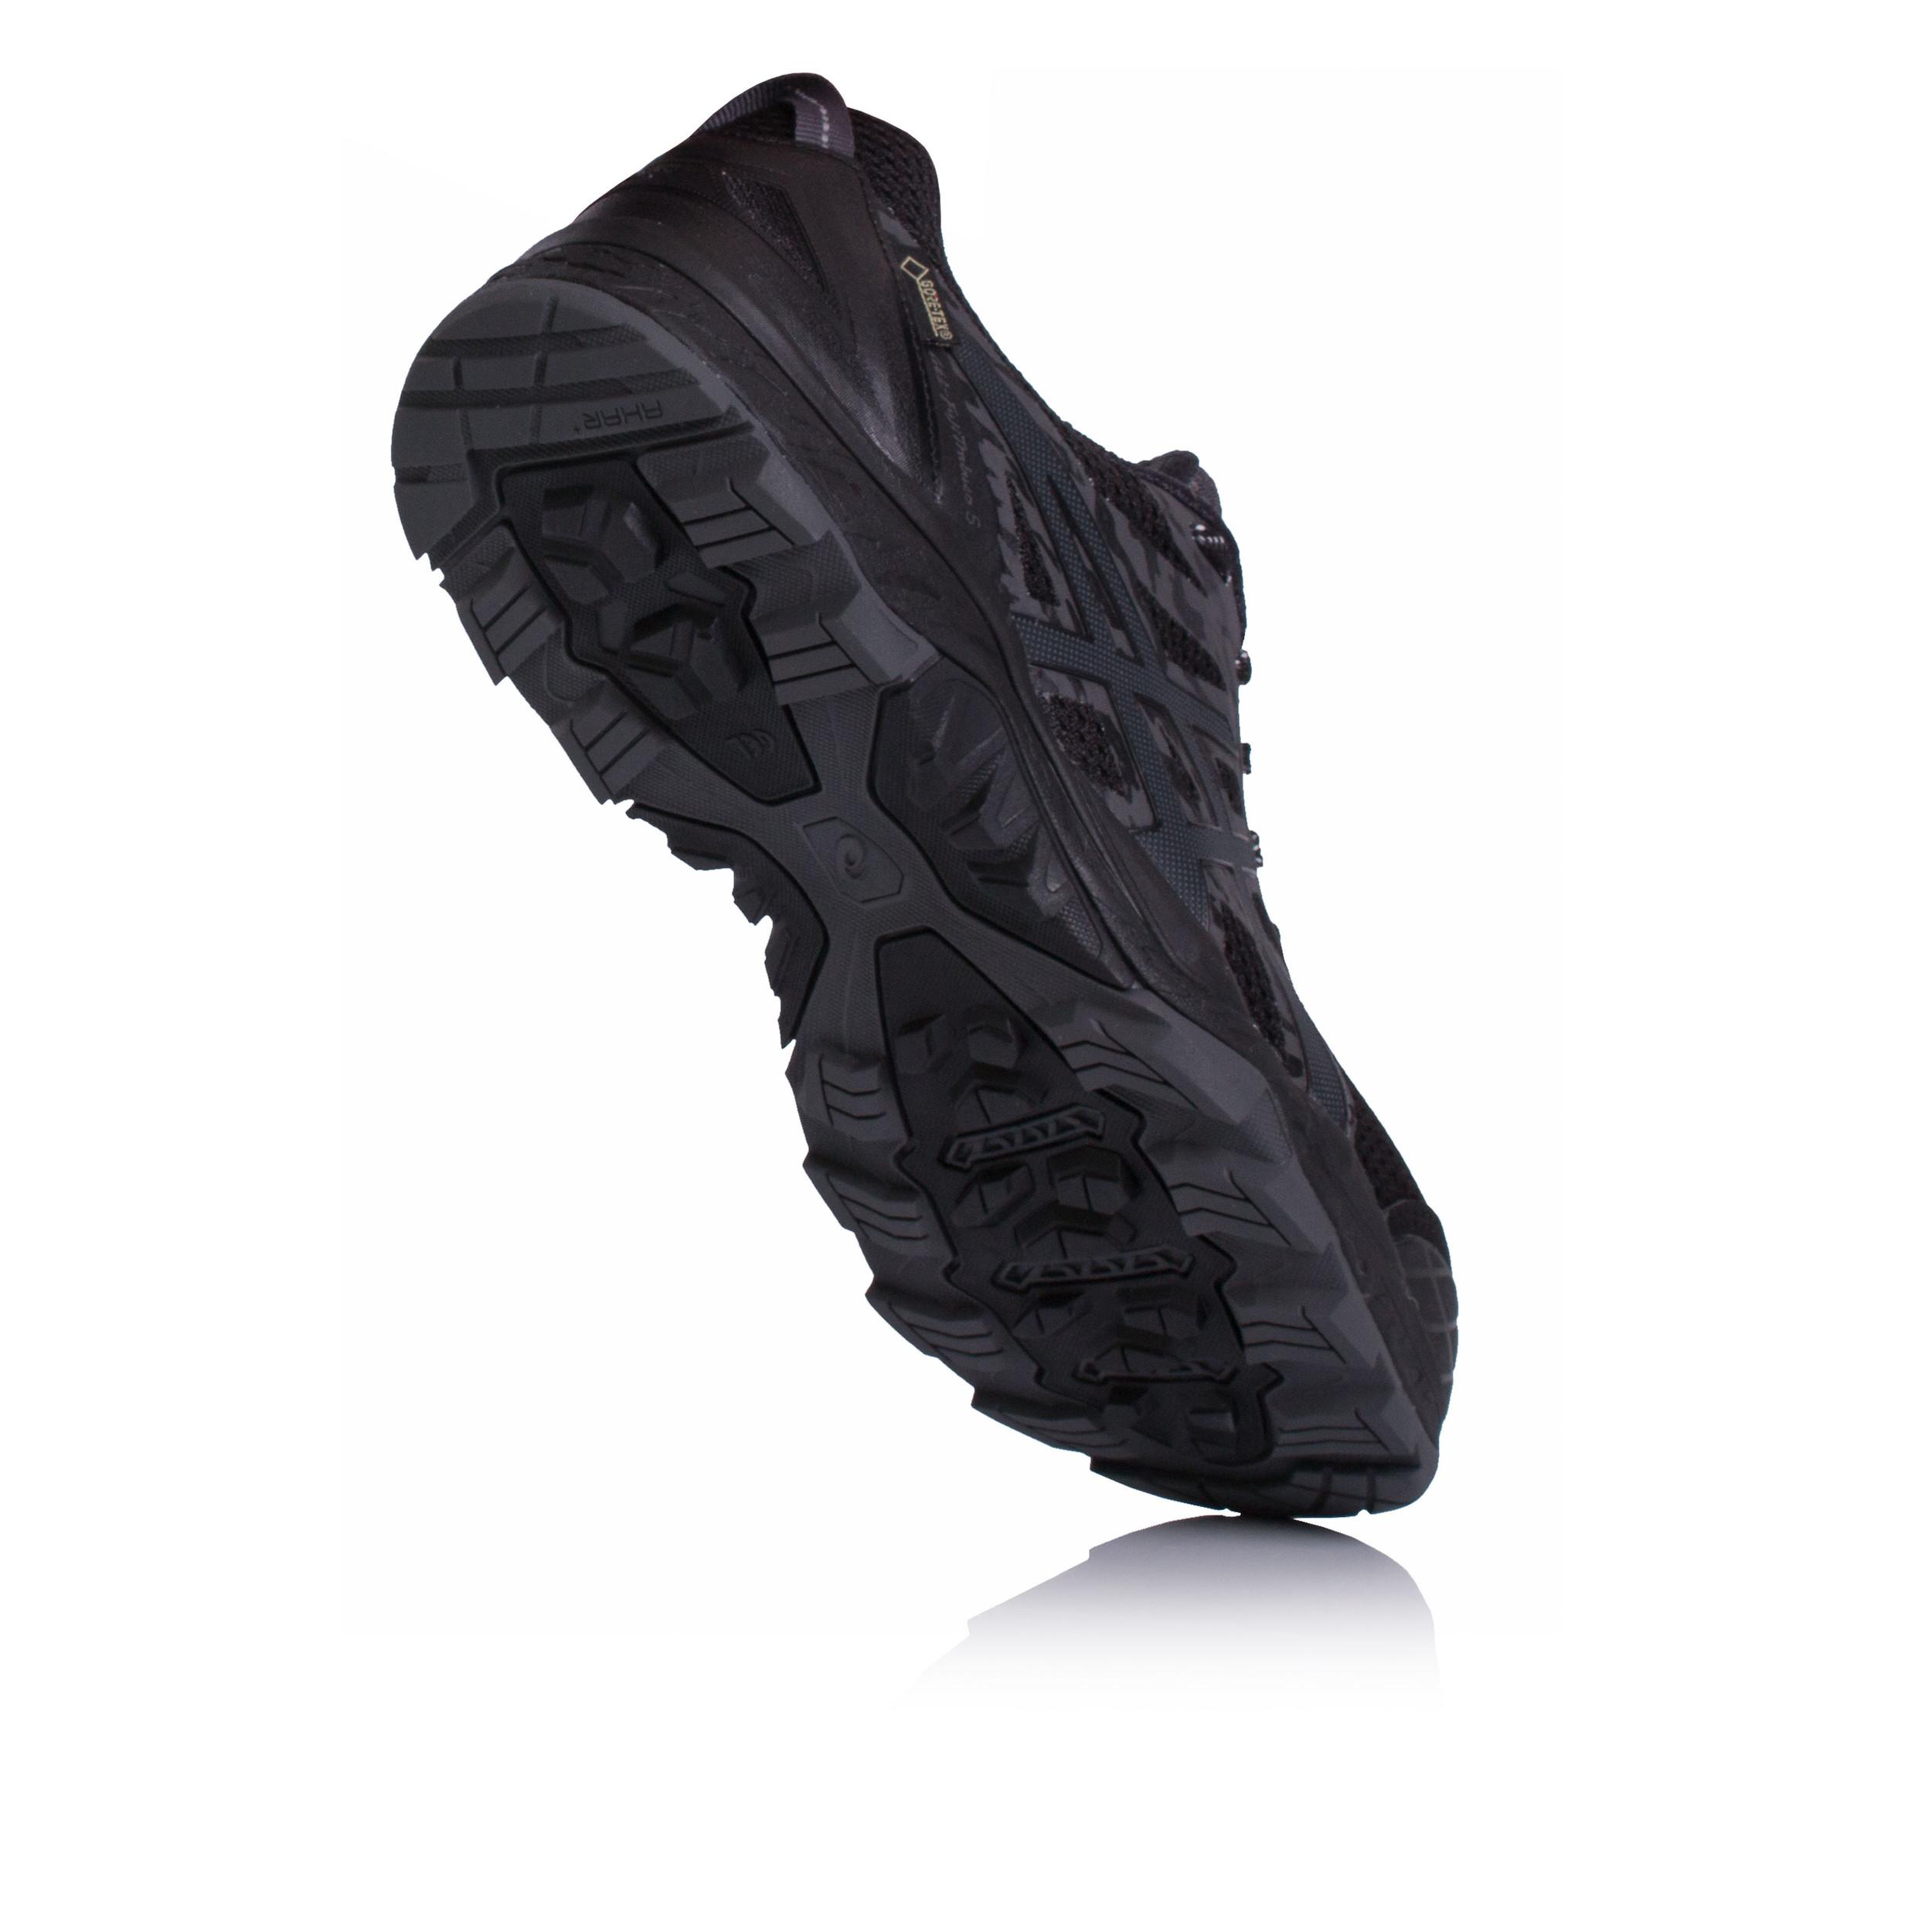 Fujitrabuco Support Shoes Black Running Gel 5 Gore Asics Womens Tex 5U1T10